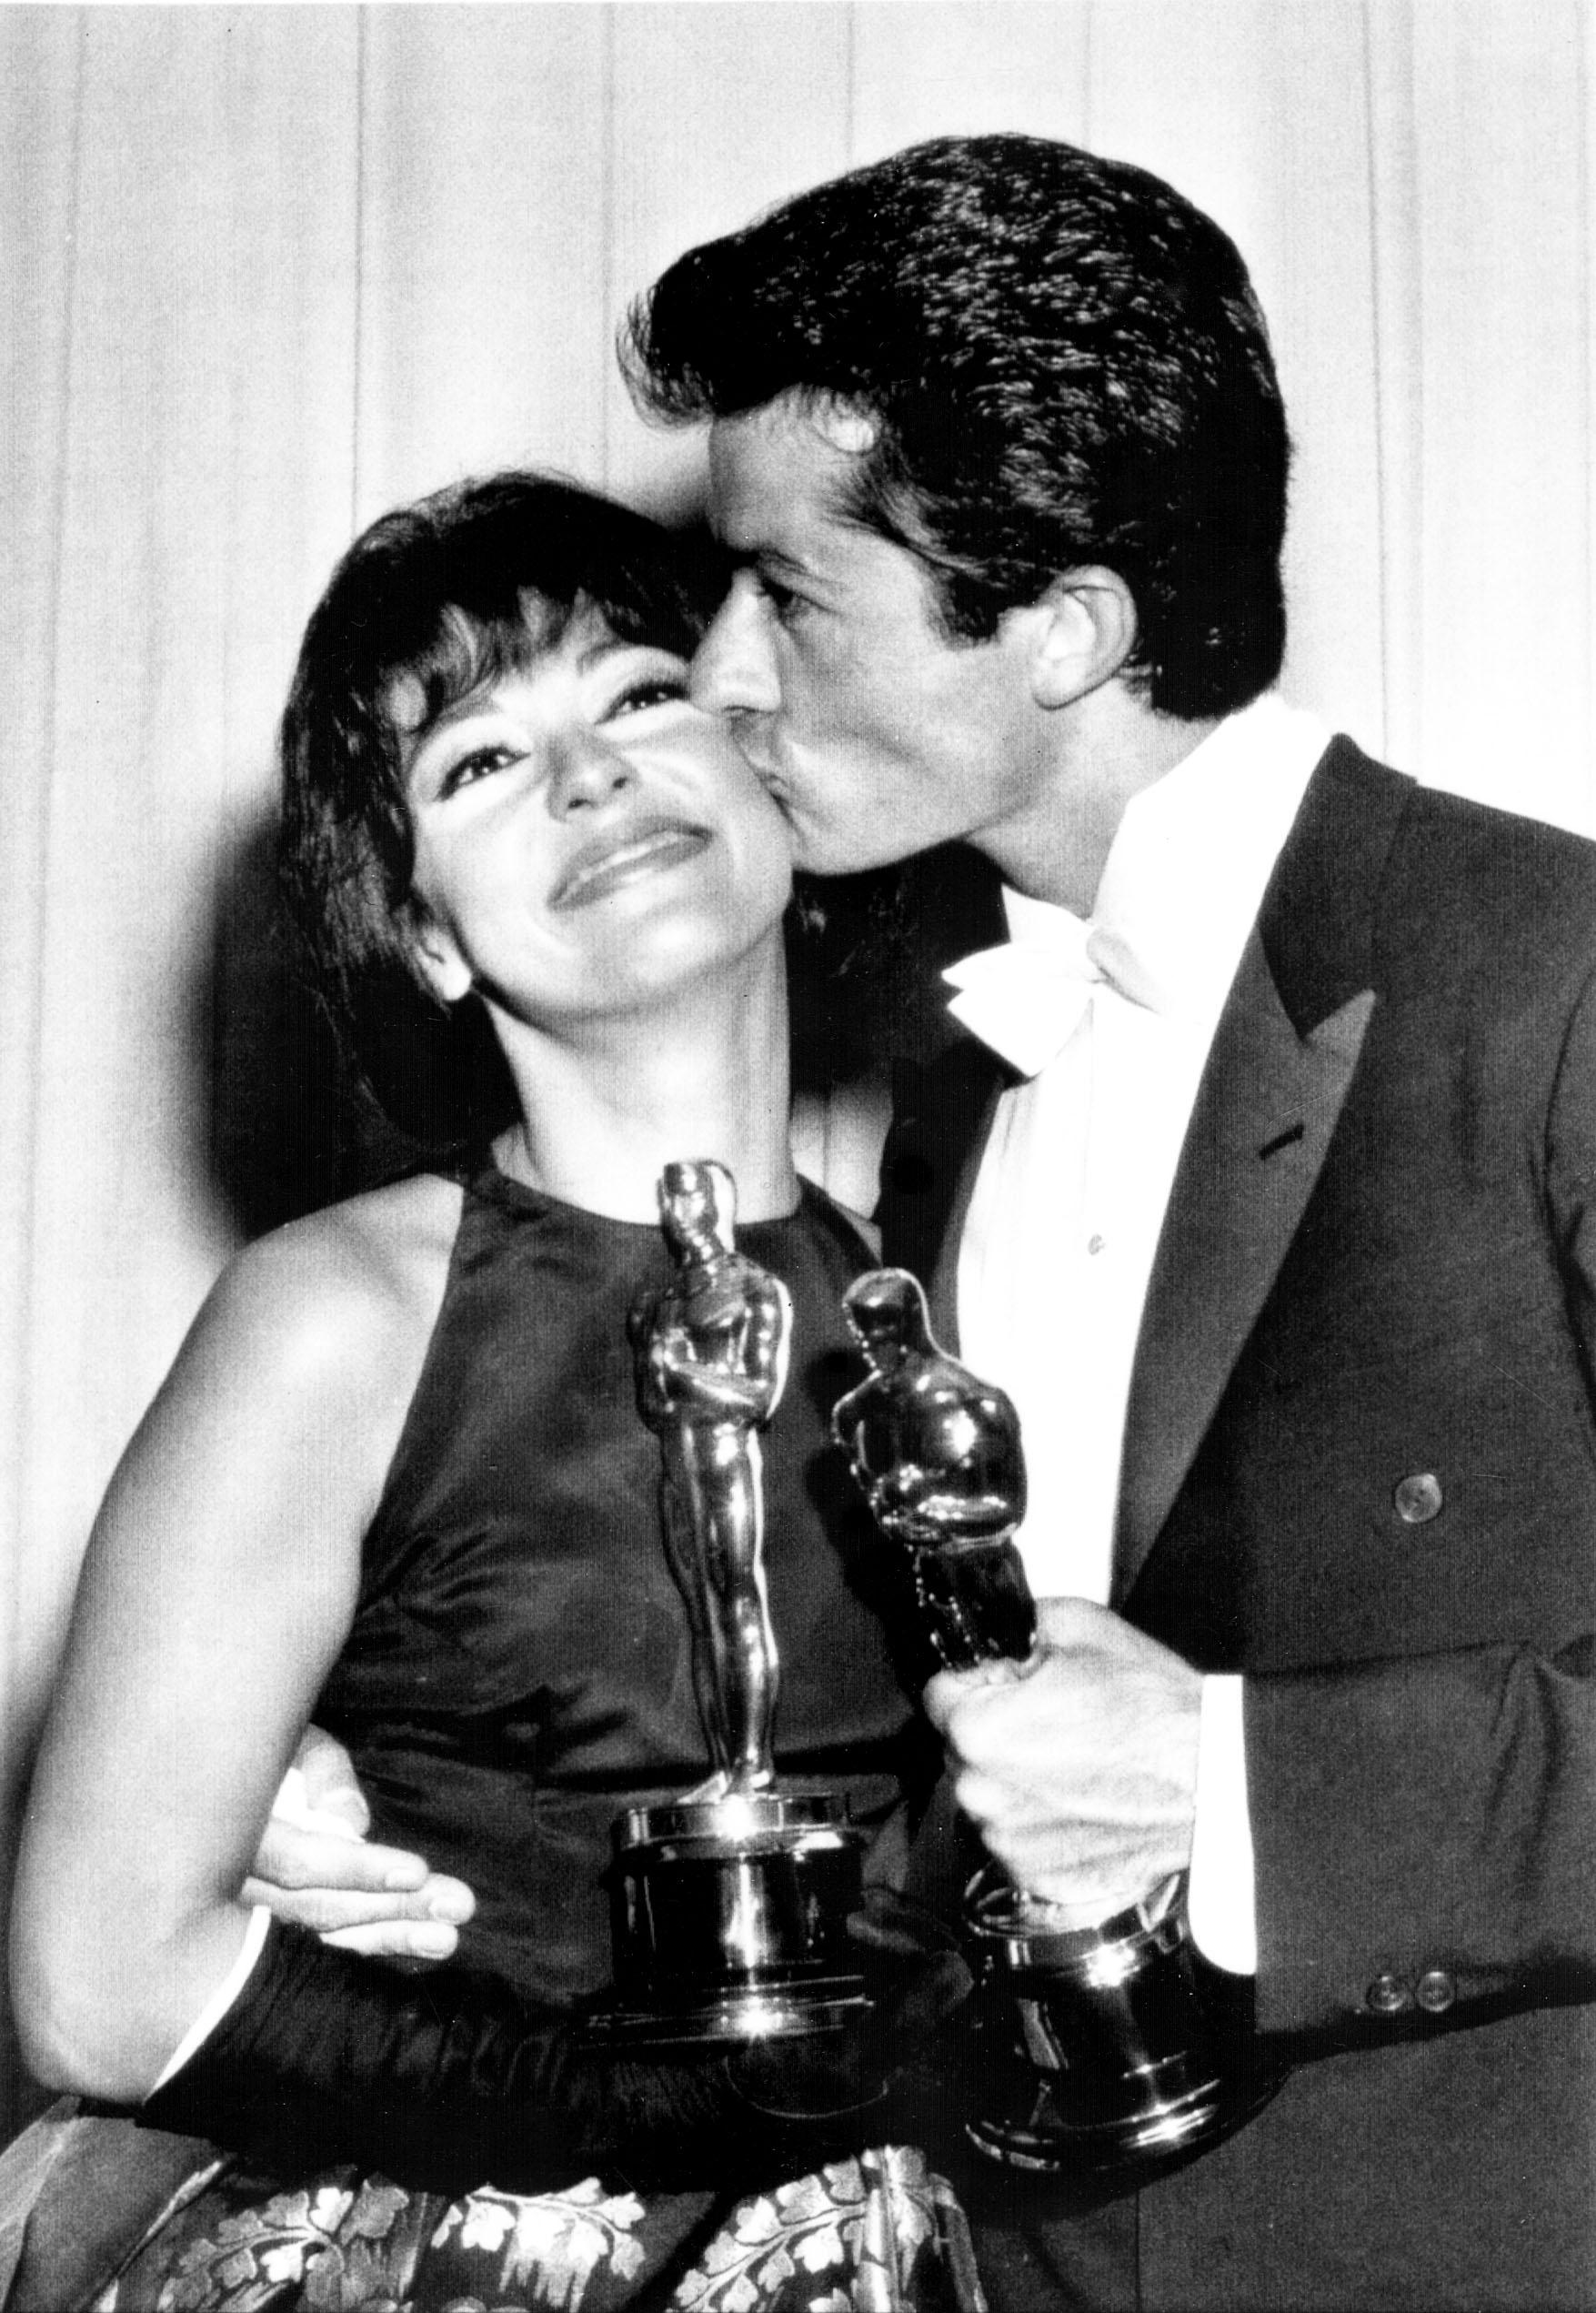 WEST SIDE STORY Oscar winners Rita Moreno, left, and George Chakiris